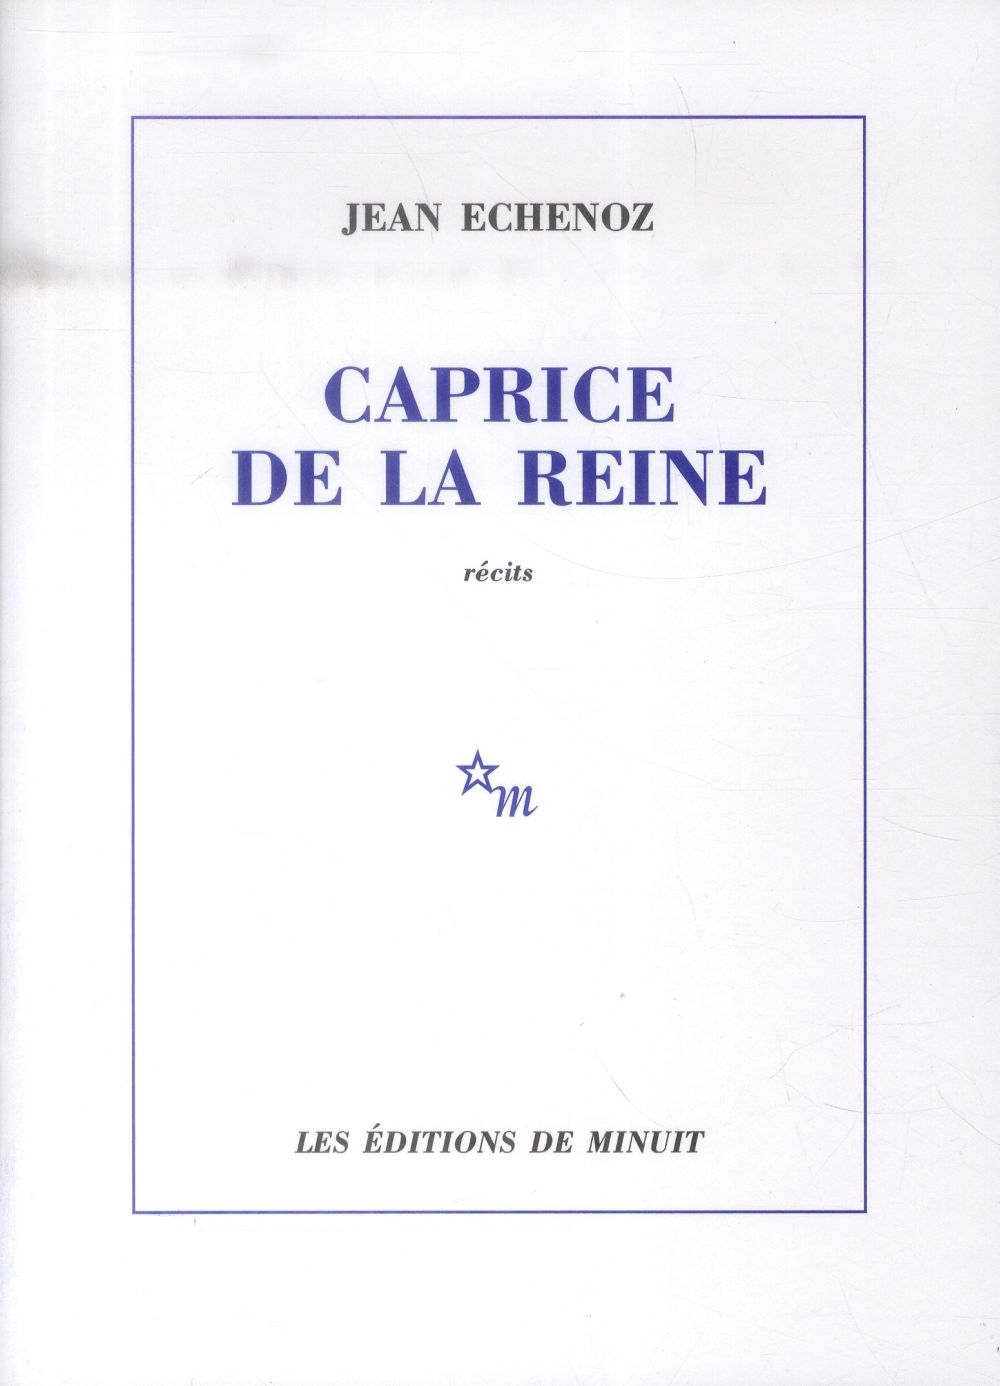 CAPRICE DE LA REINE Echenoz Jean